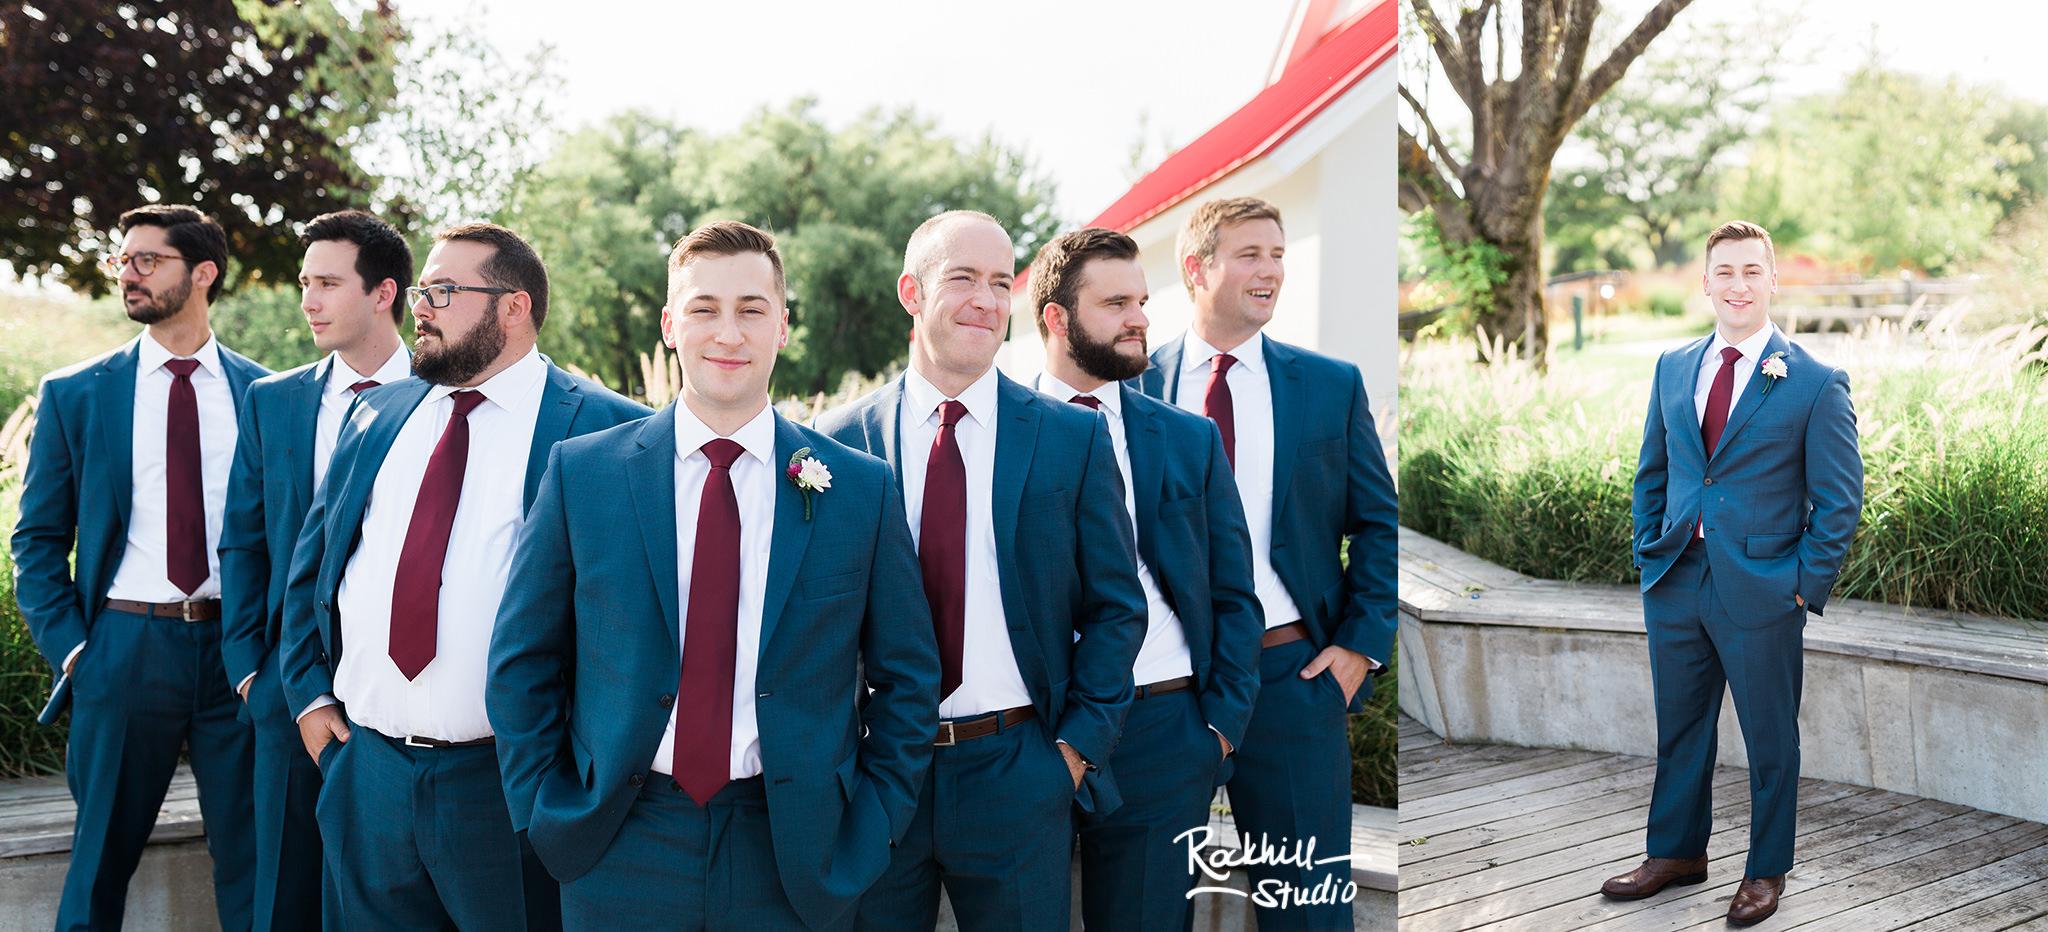 northport michigan groomsmen, traverse city wedding photography rockhill studio